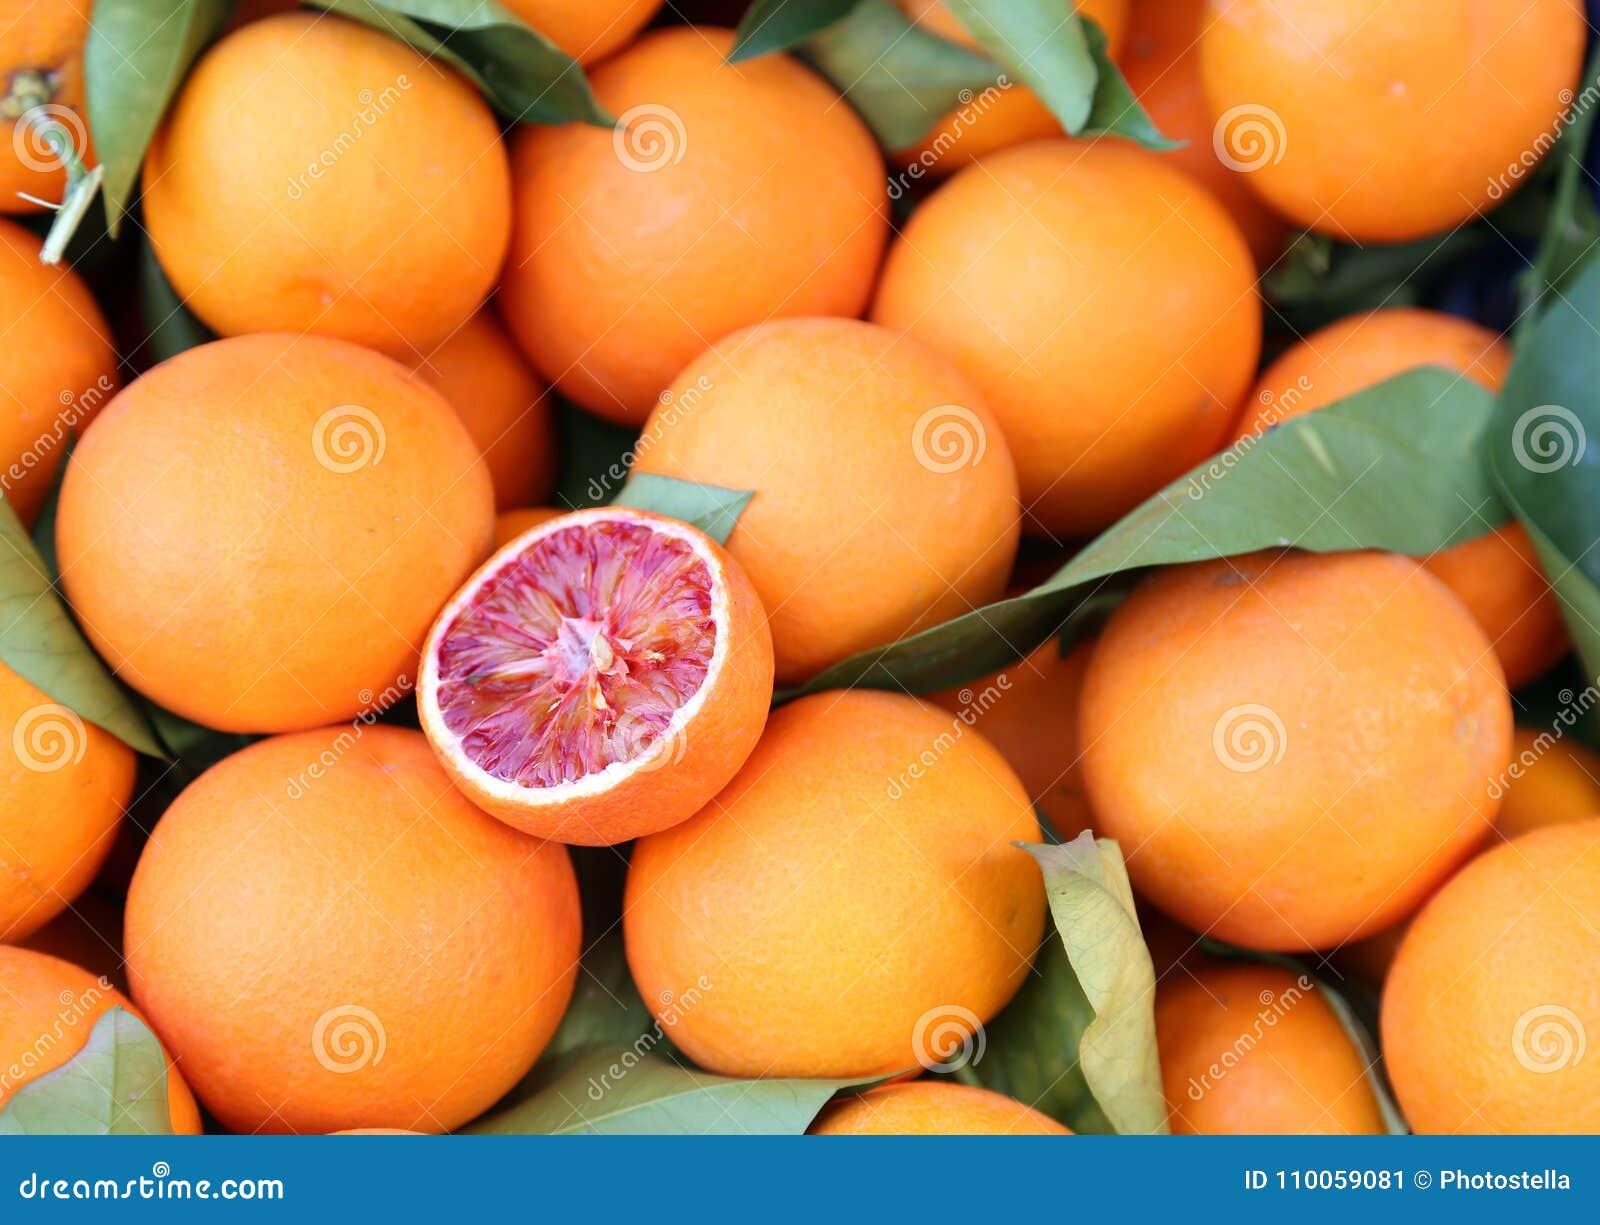 Laranjas na loja de mantimento - laranja pigmentada do tarocco - laranja otimista